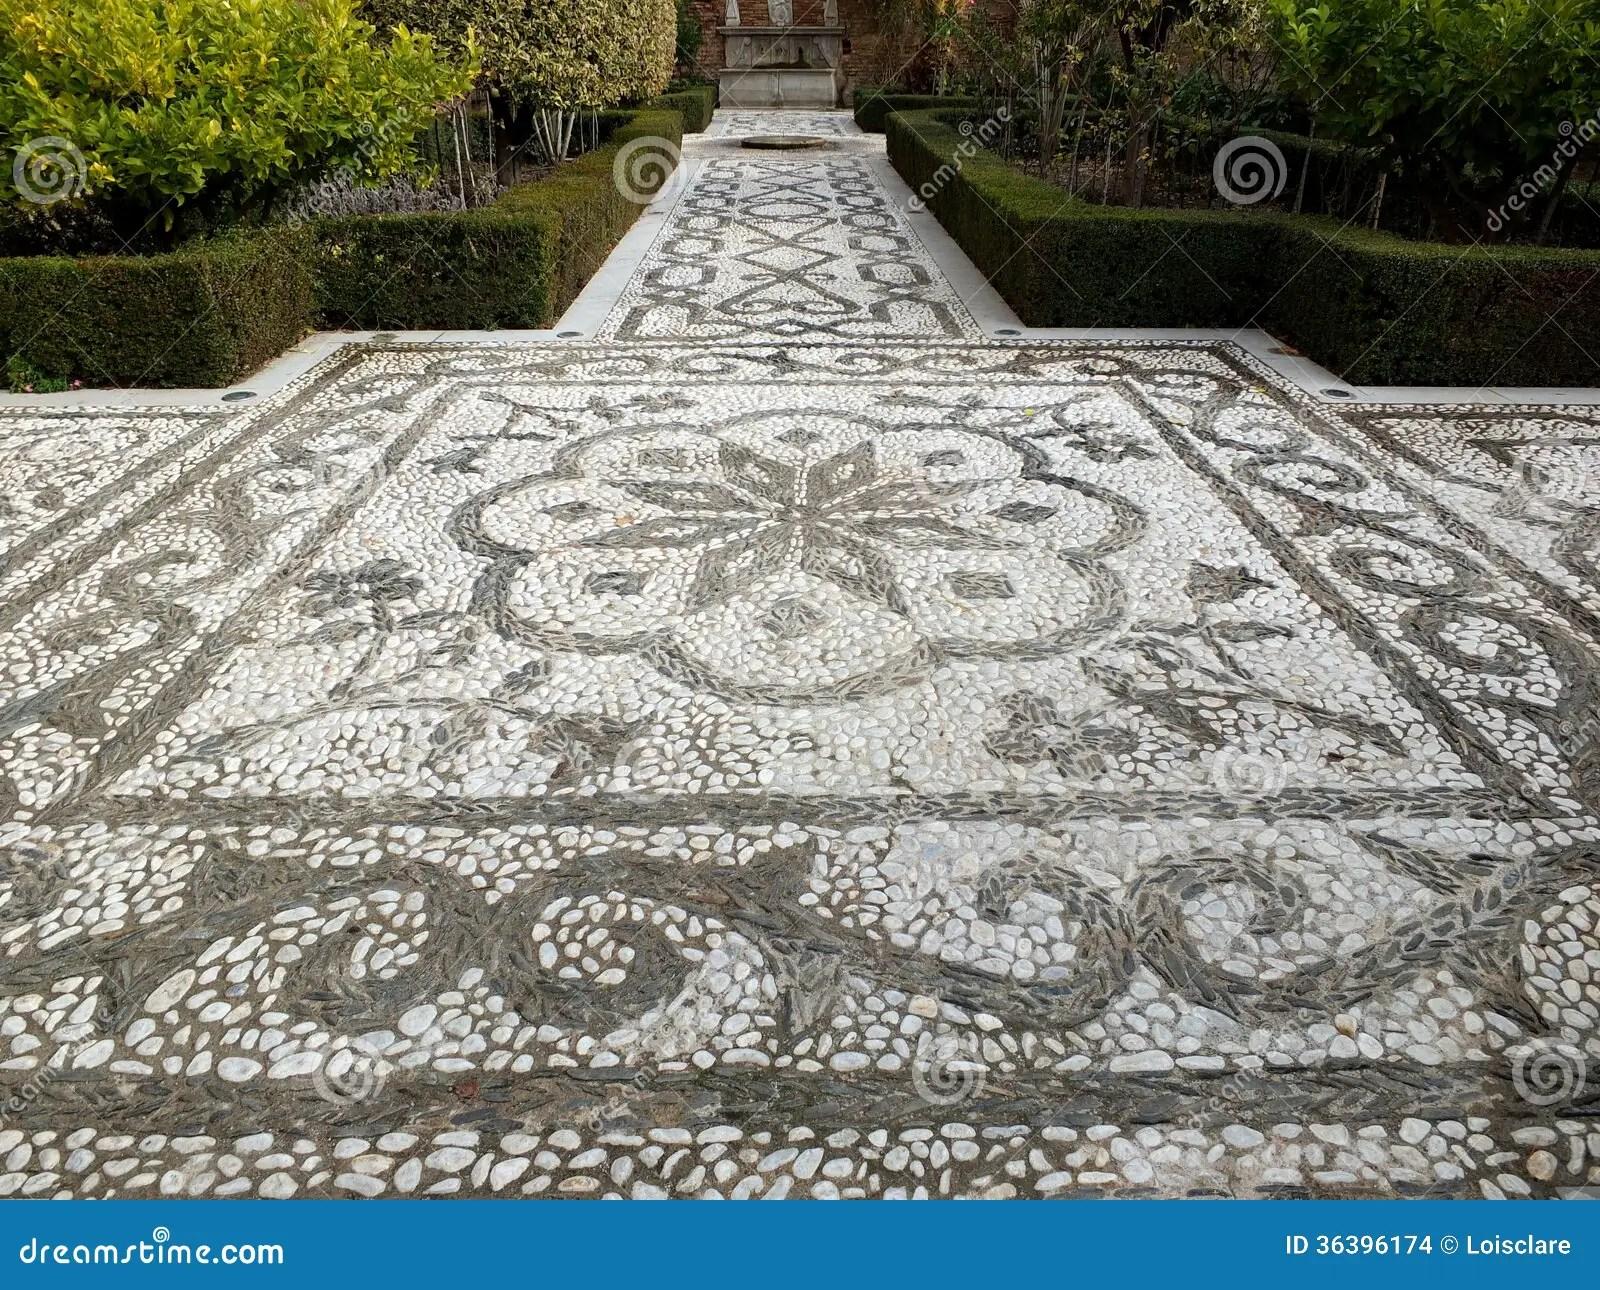 Alhambra Mosaic Garden Path Stock Photo  Image 36396174